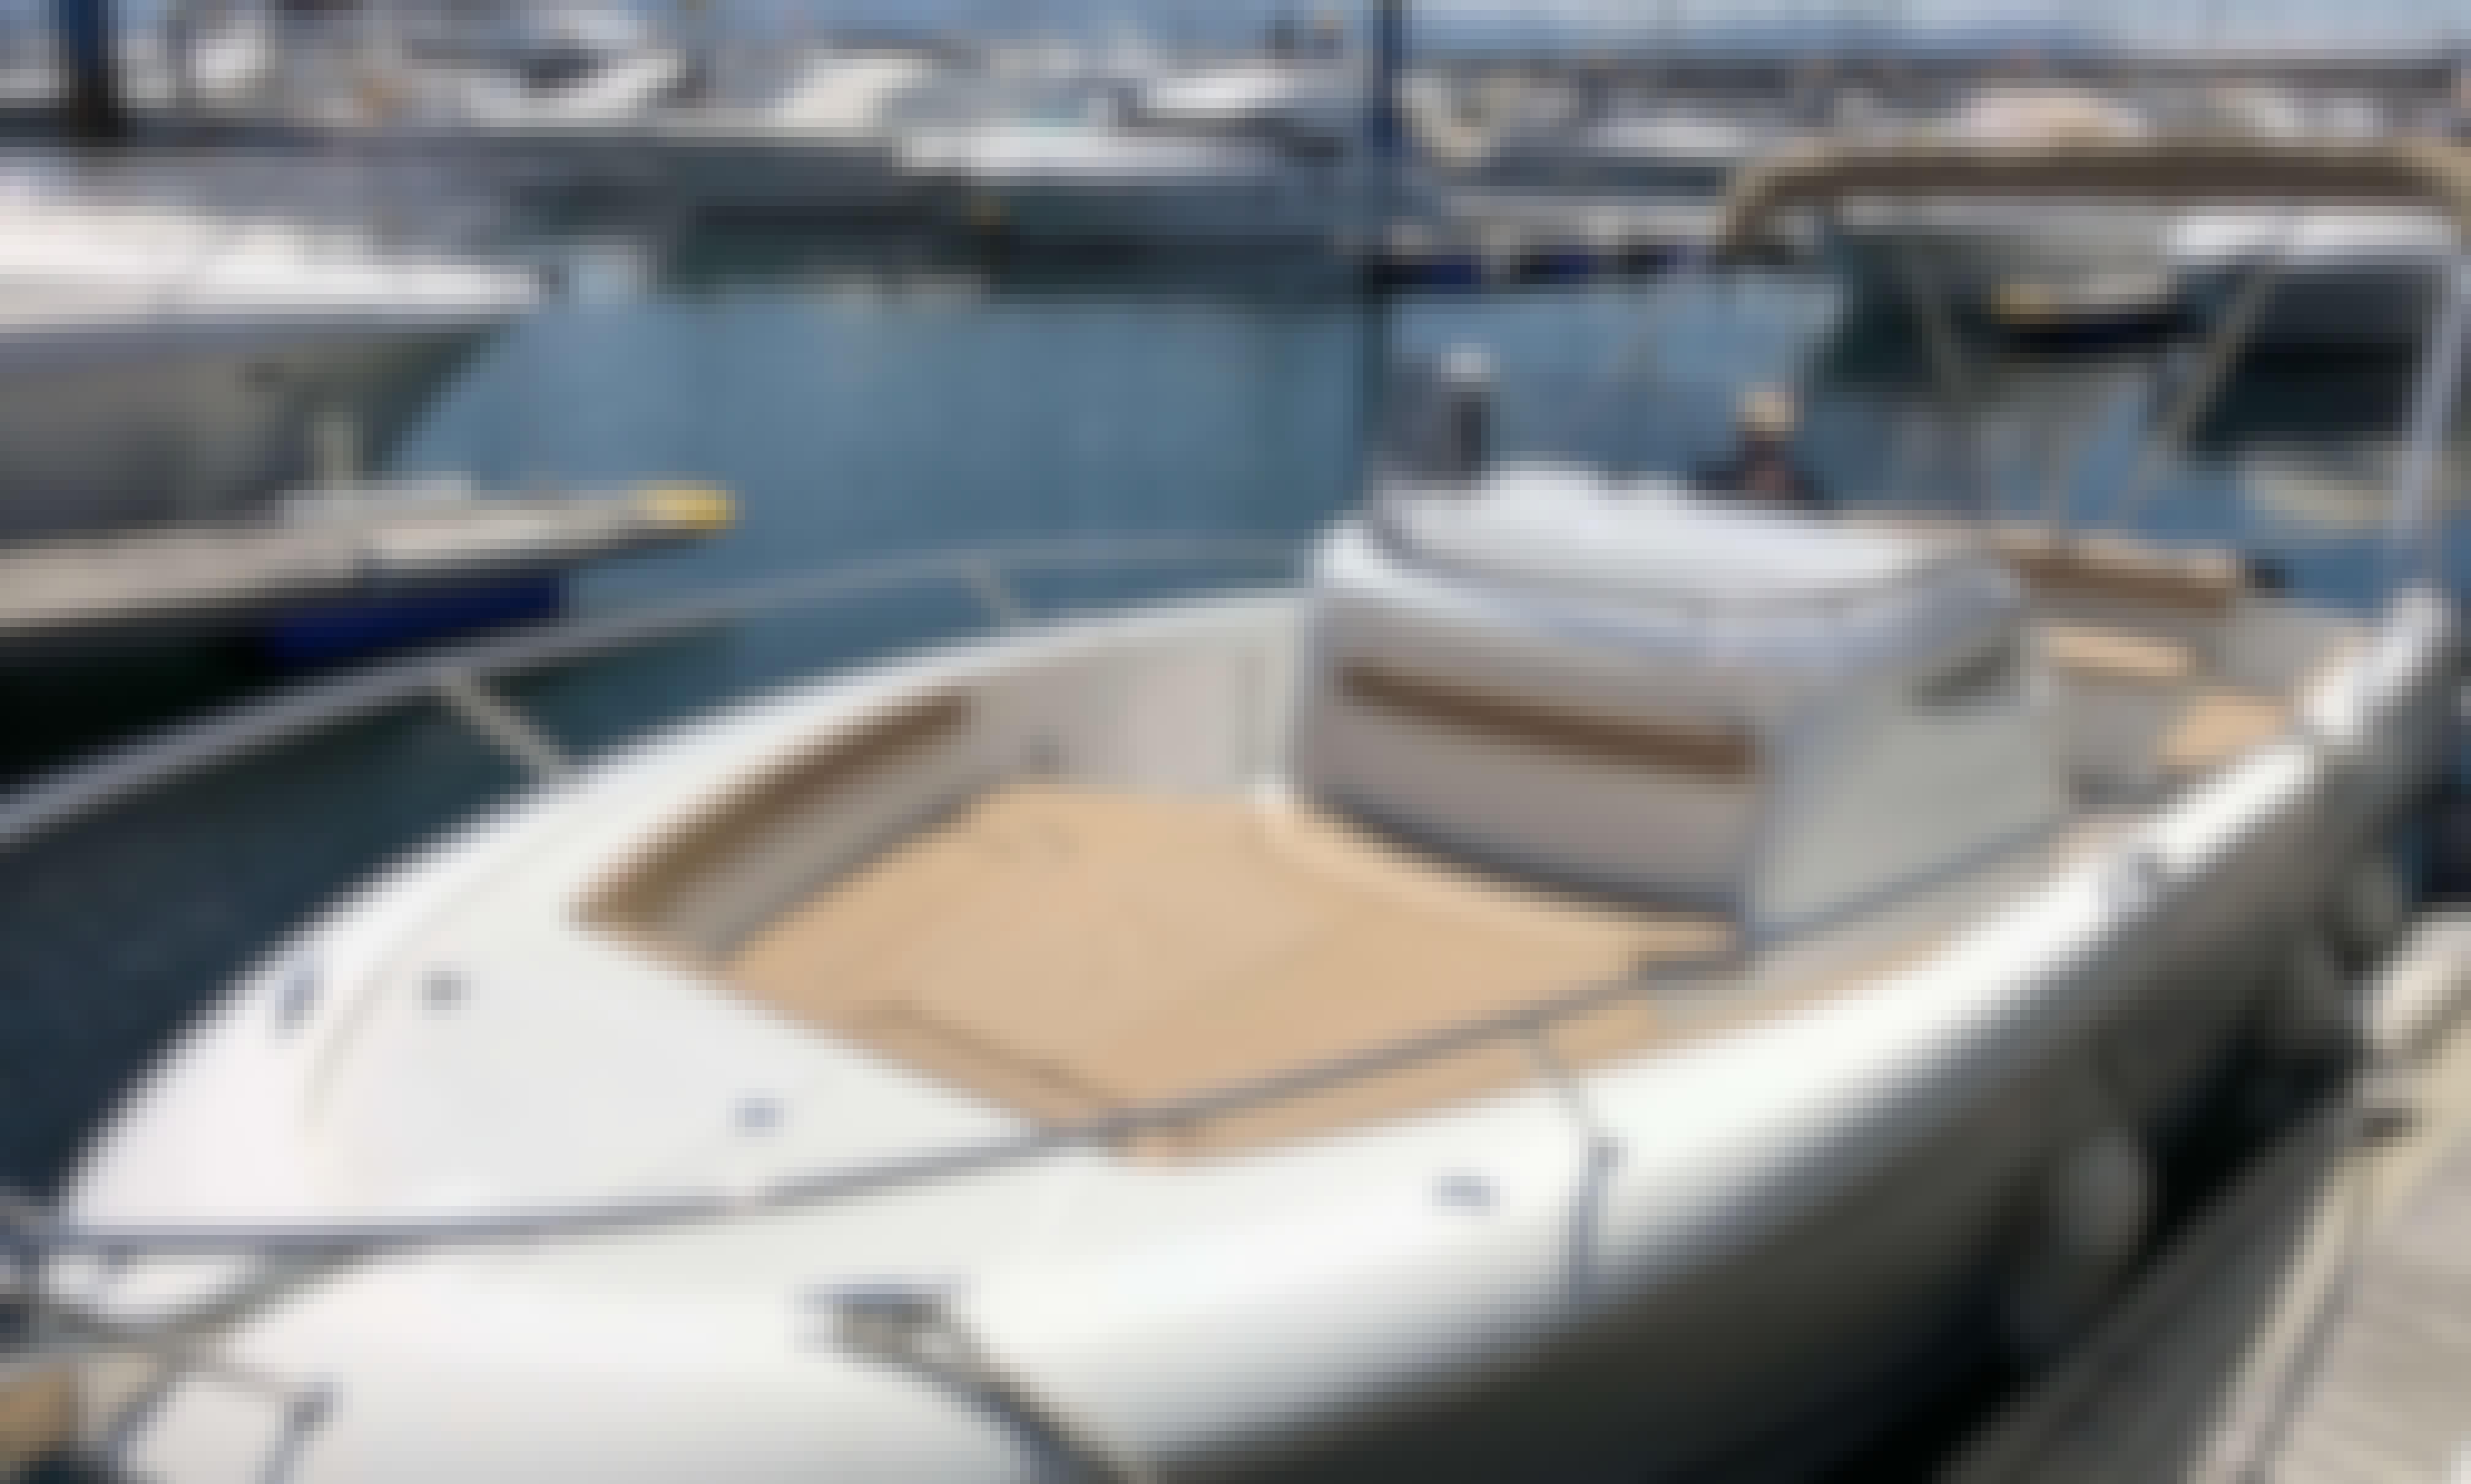 2013 Cap Camarat 8. 5 Yacht Rental in Vigo with skipper, Galicia